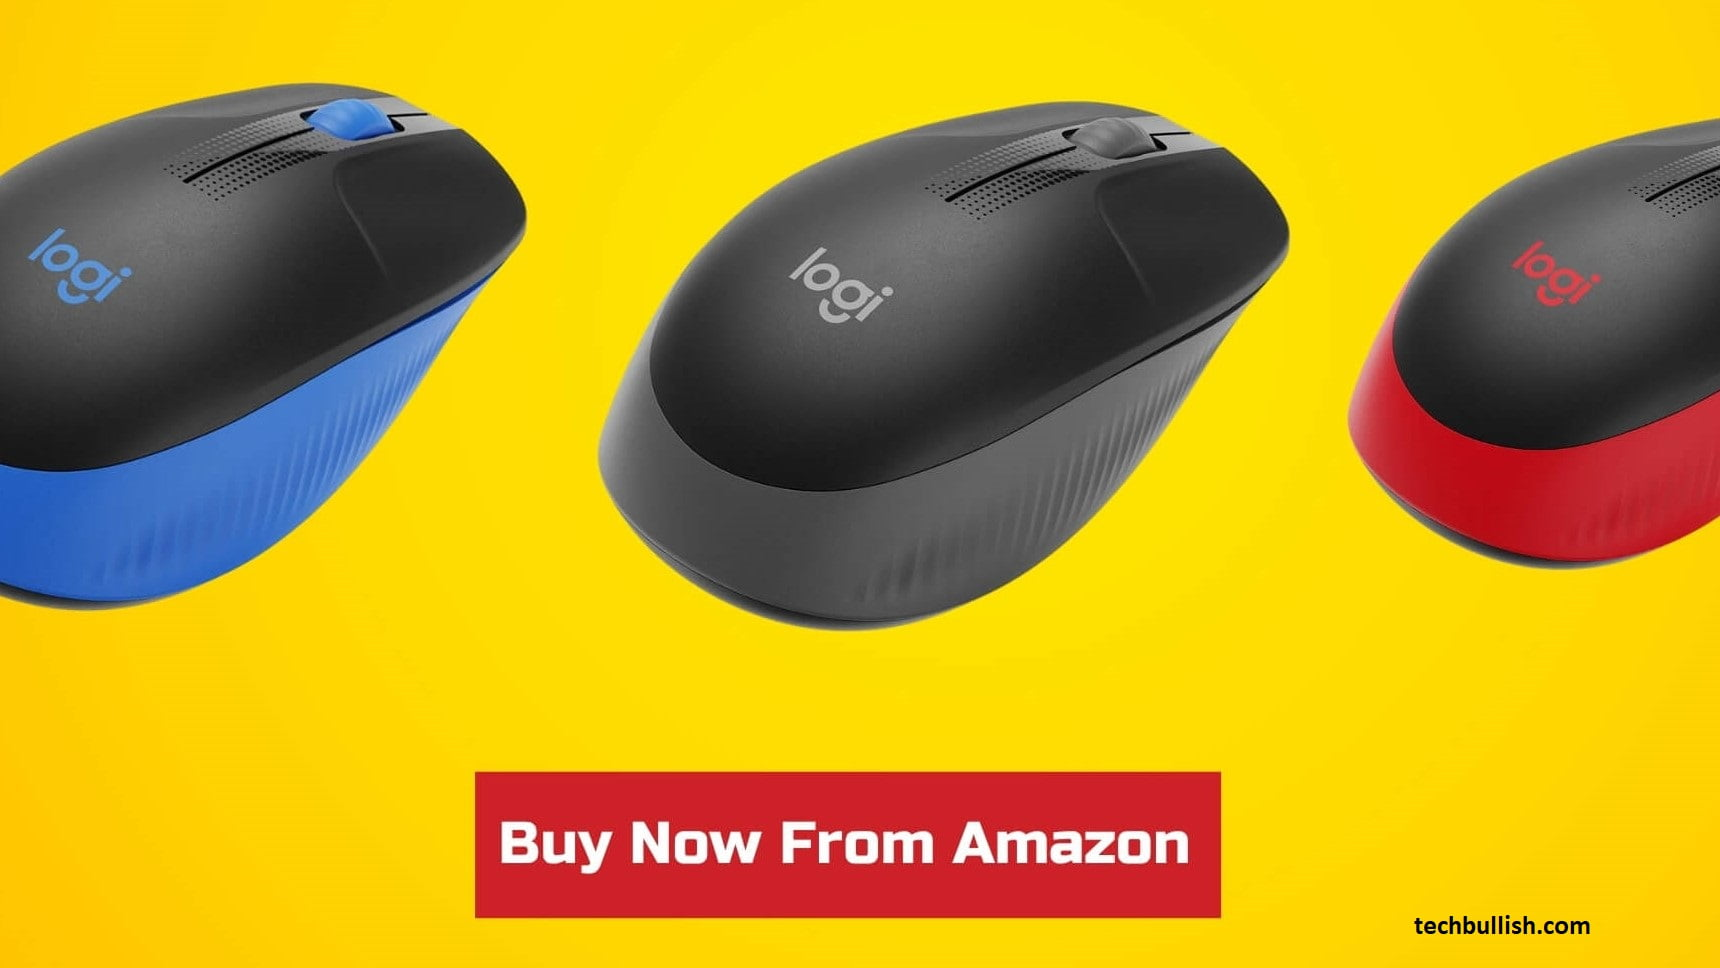 Logitech-M190-wireless-mouse-review